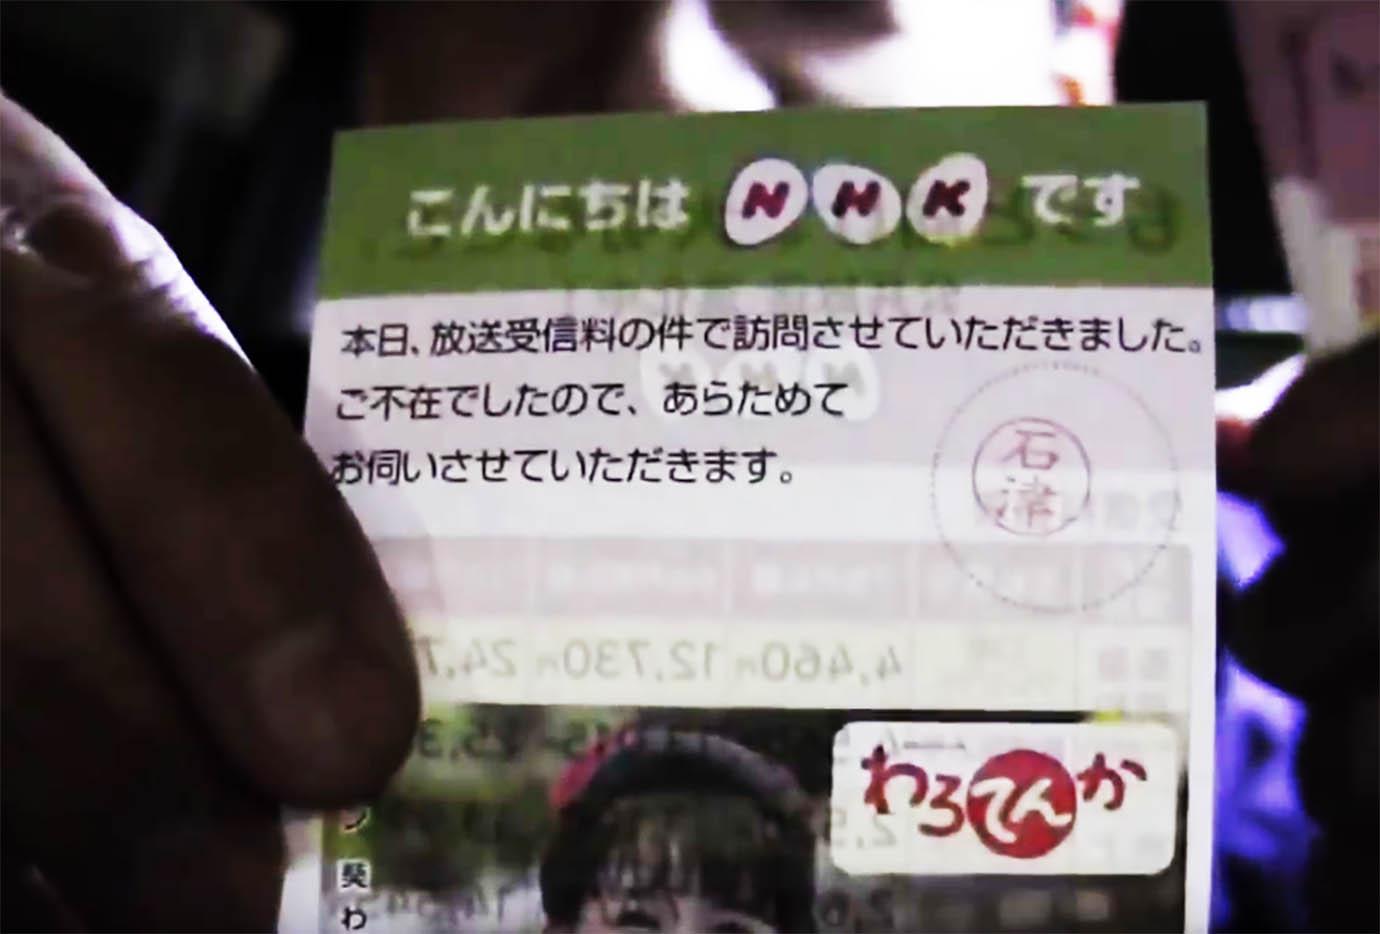 NHK「スマホ4年縛り、理解せず加入してませんか?」 お前ん所は強制加入だろと批判殺到